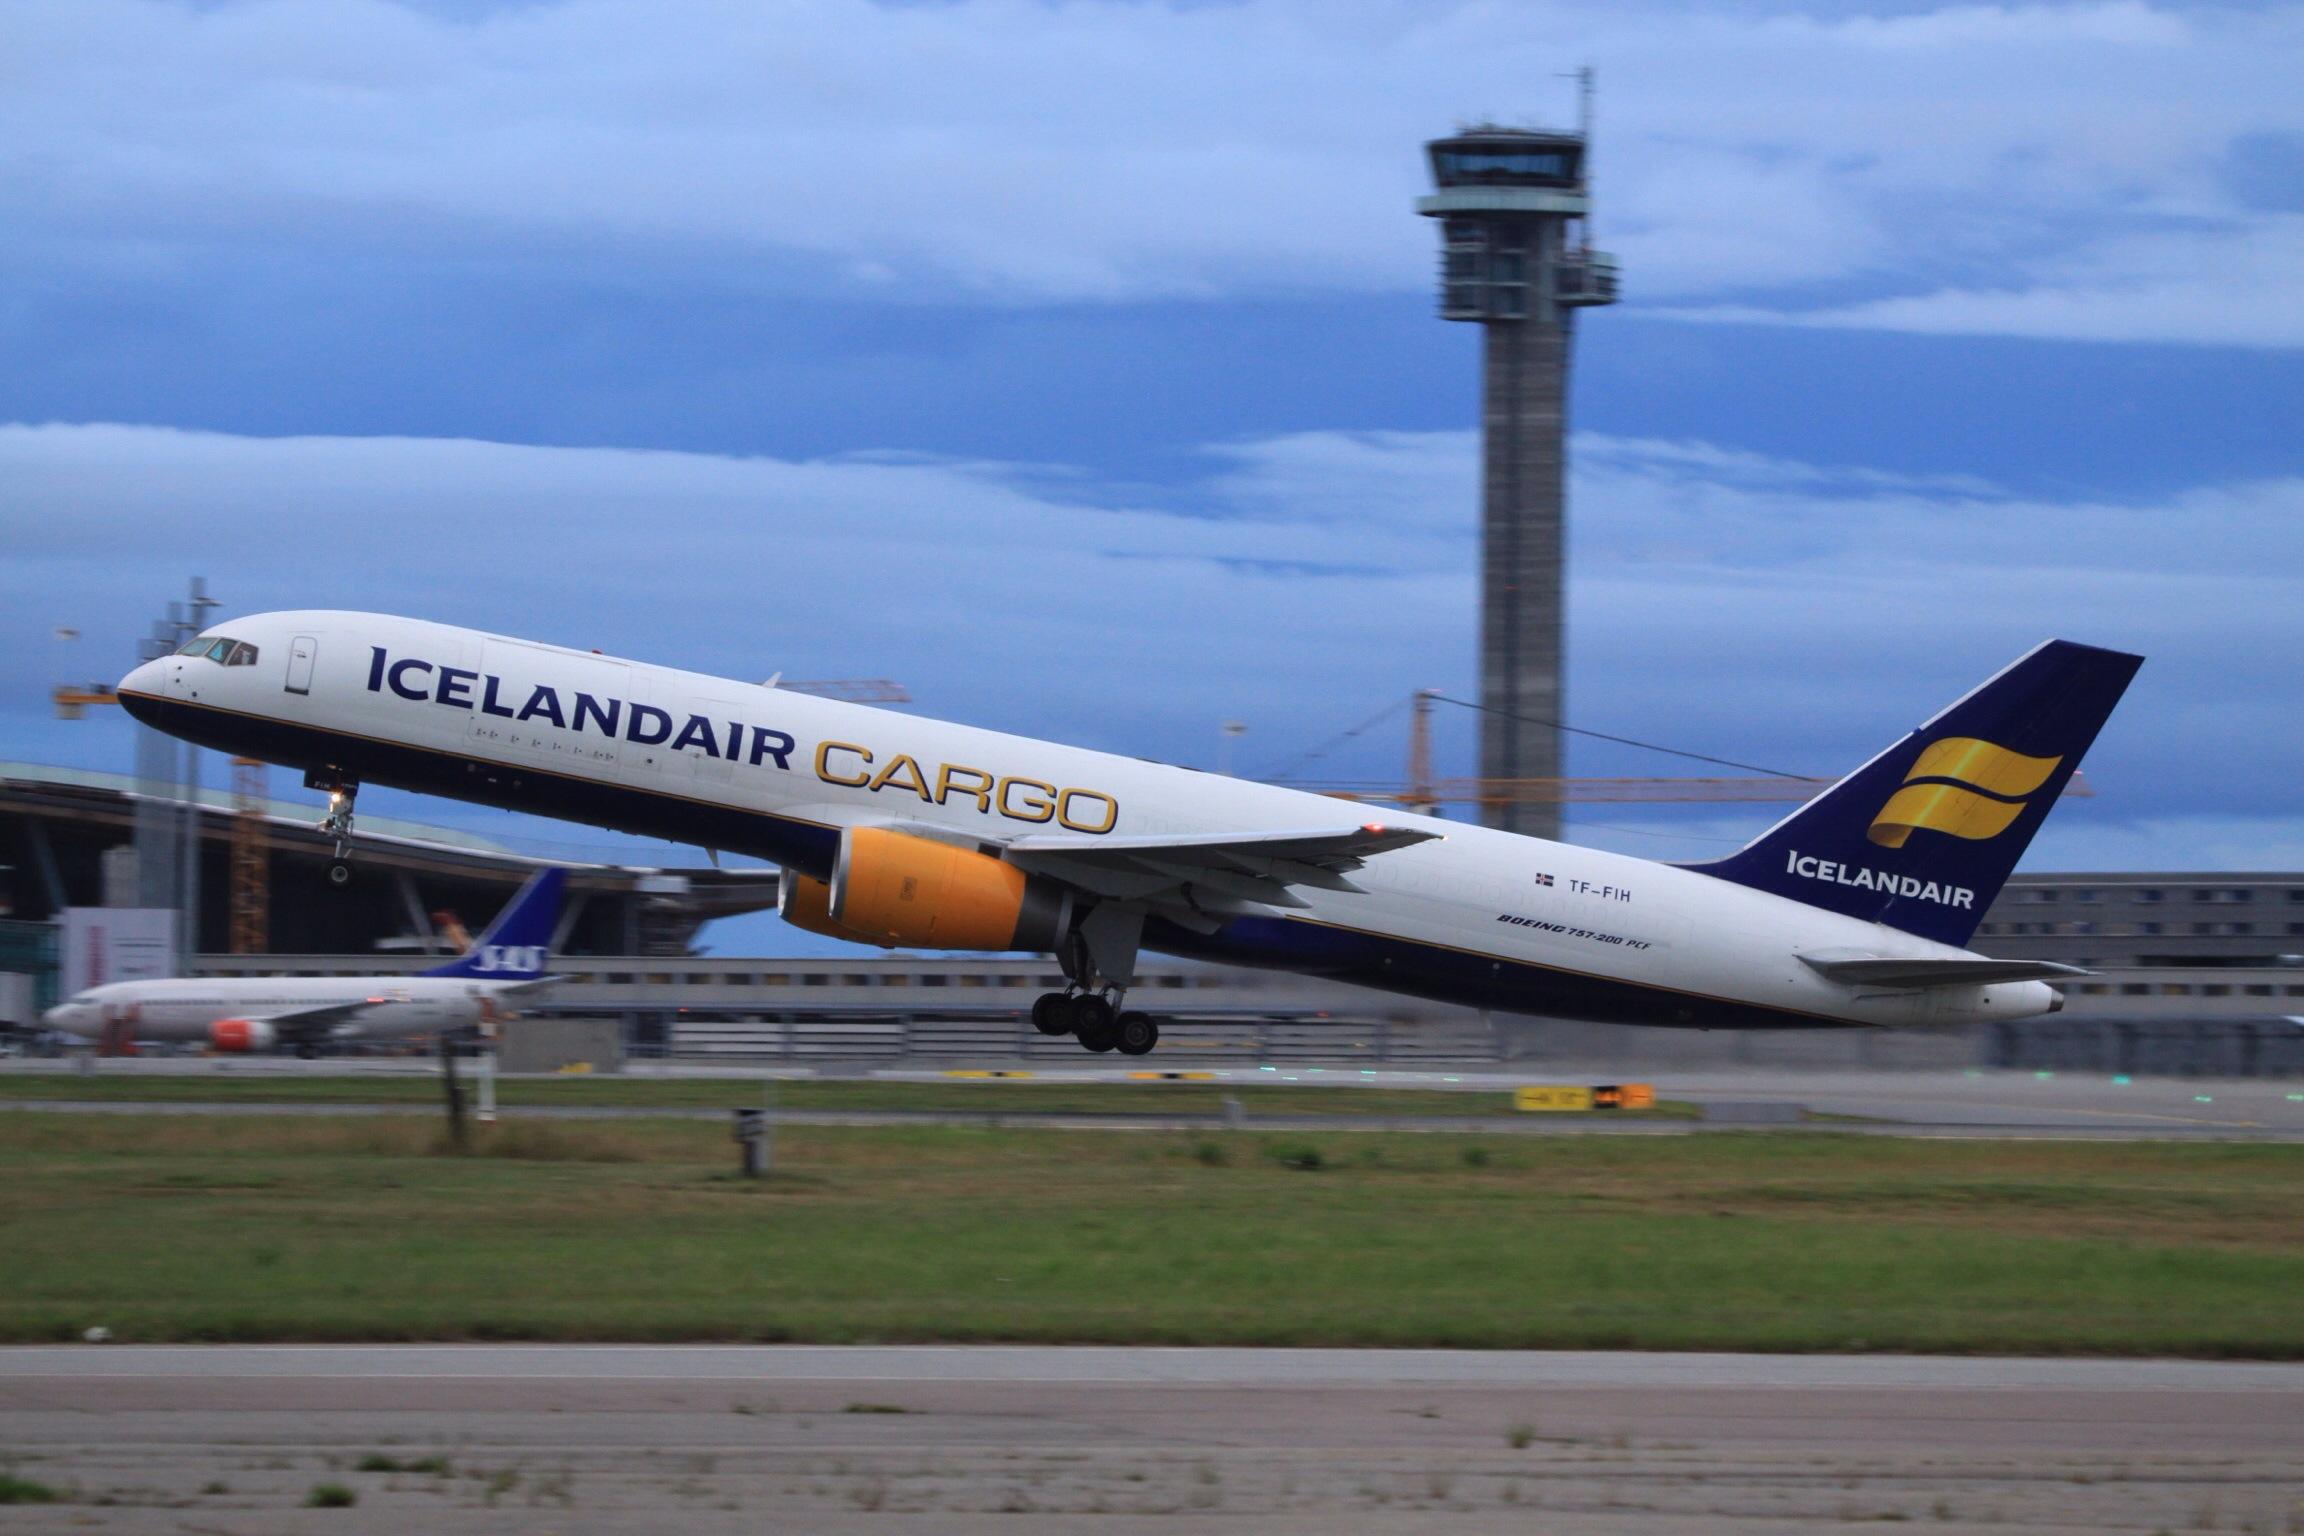 Icelandair cargo photo